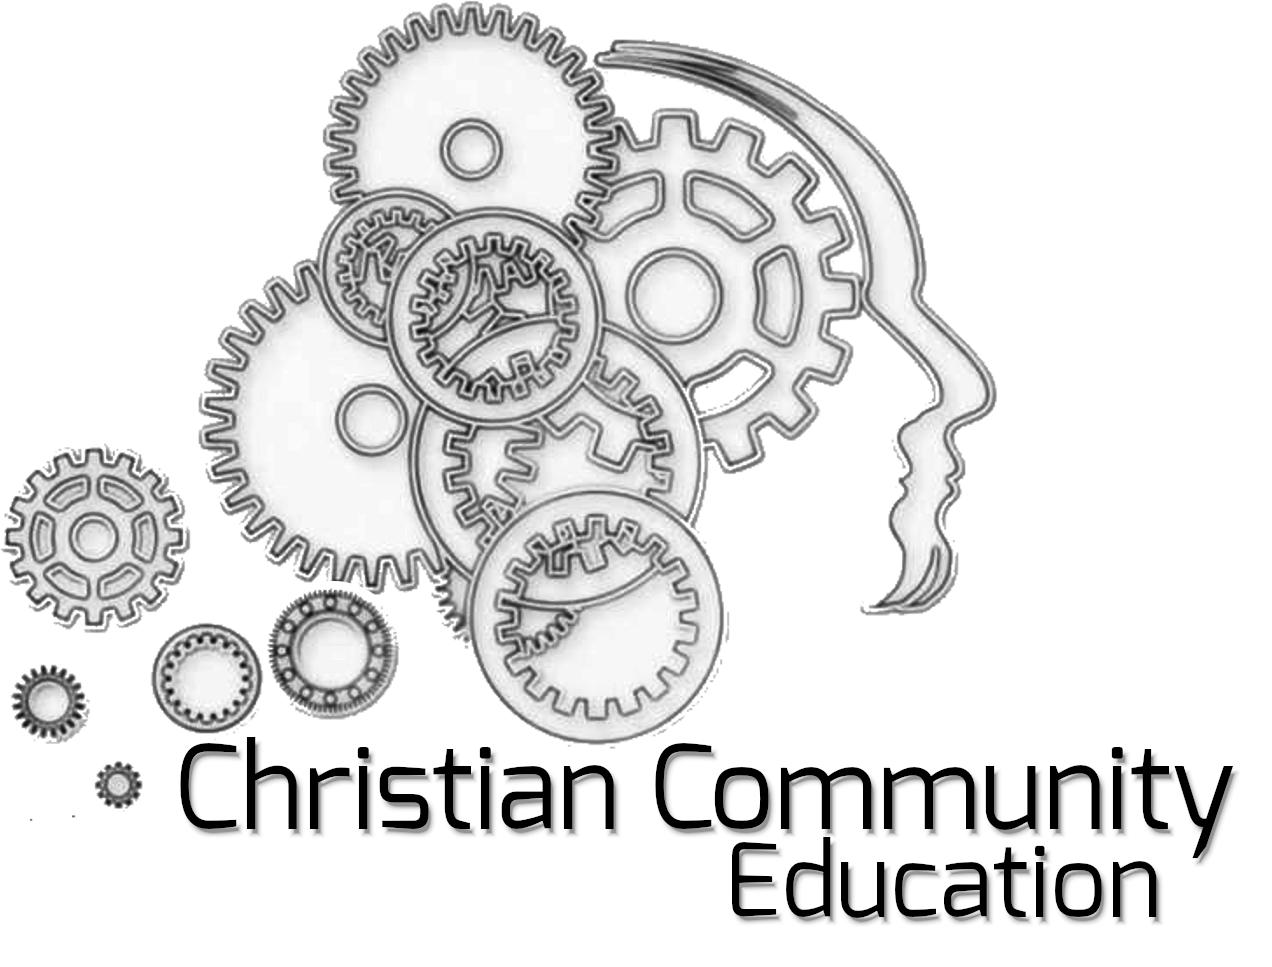 Christian Community Education